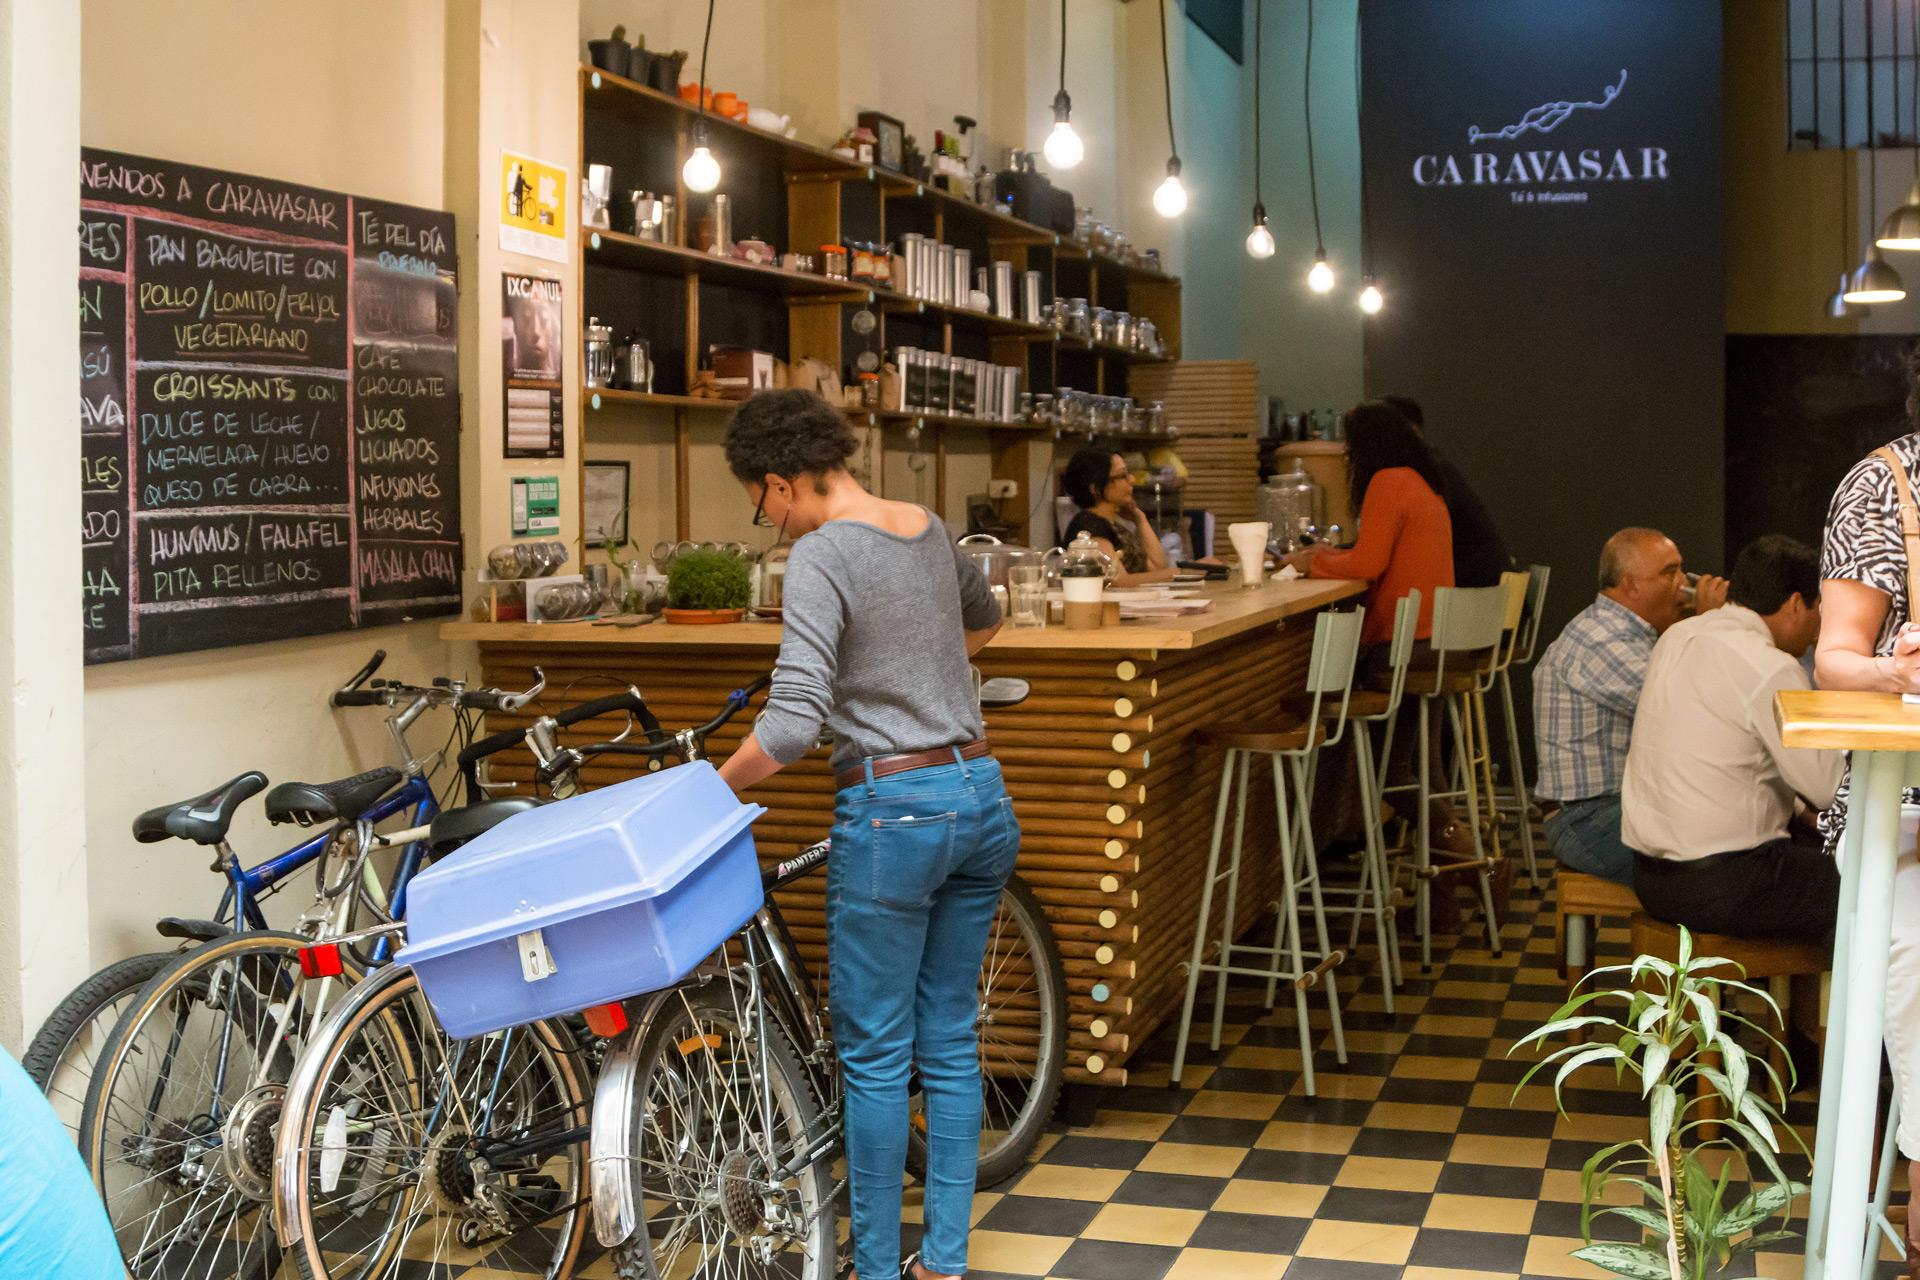 walking-tour-foodie-zona-1-uno-pablo-bromo-caravasar-te-local-restaurante